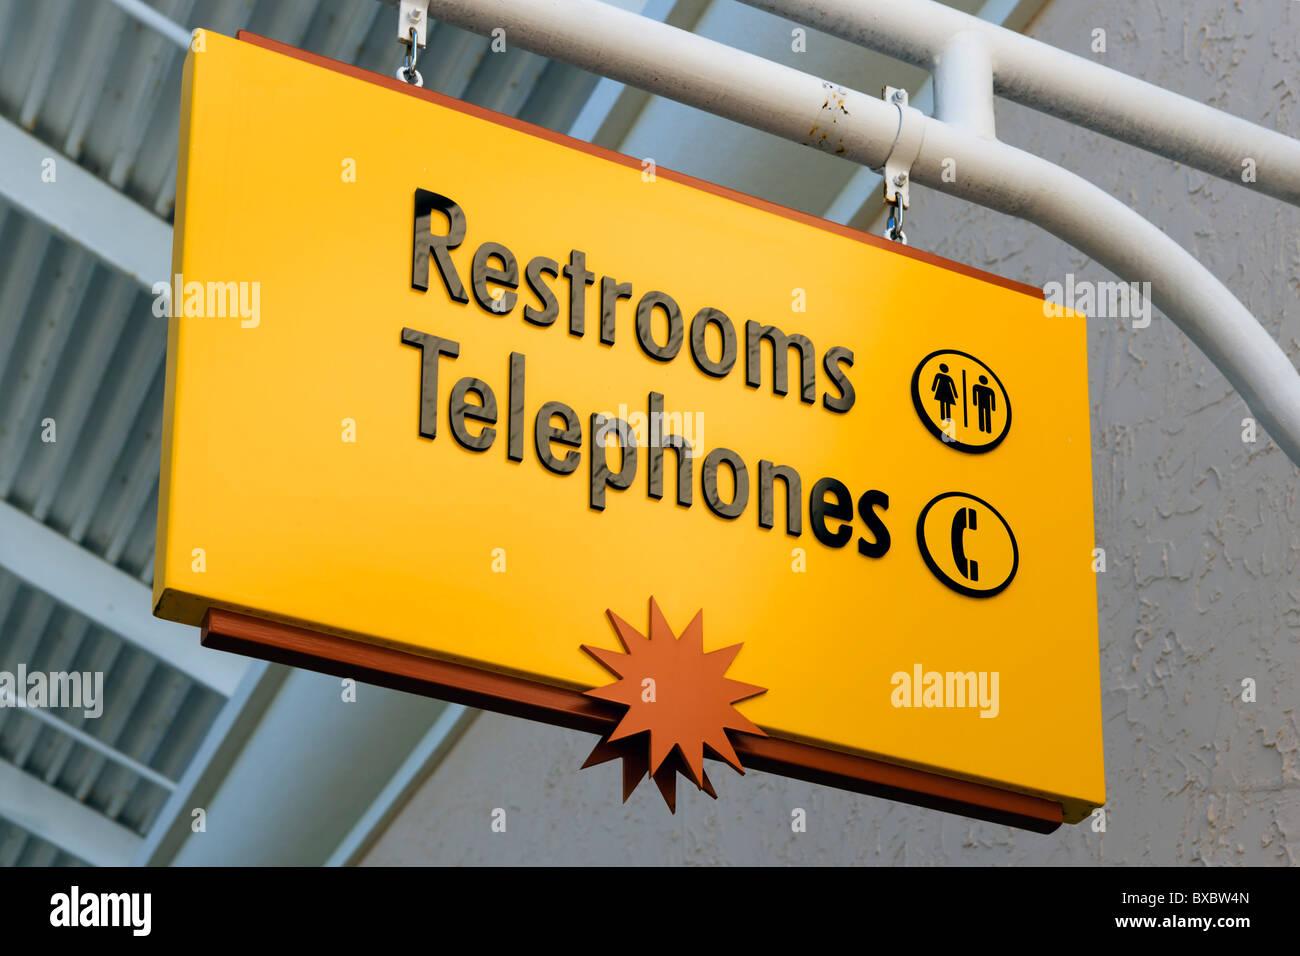 Telephones and Restrooms sign, Orlando Premium Outlets, Lake Buena Vista, Orlando, Florida, USA - Stock Image